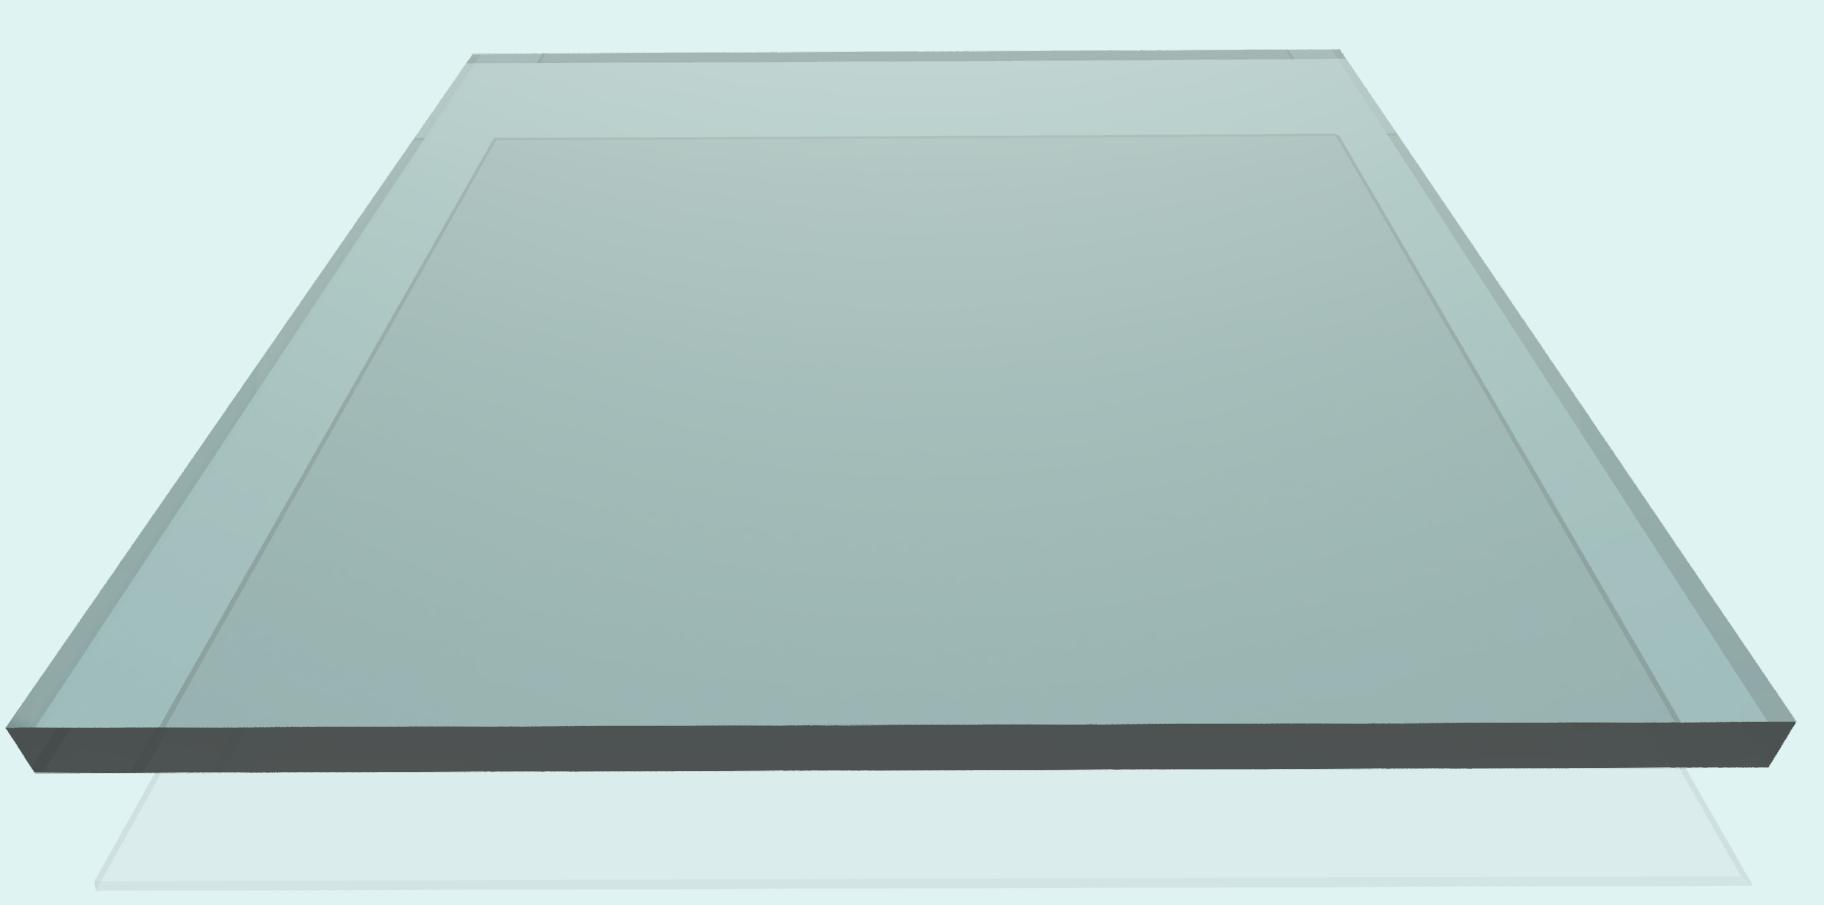 Plexiglas 8 mm, klar